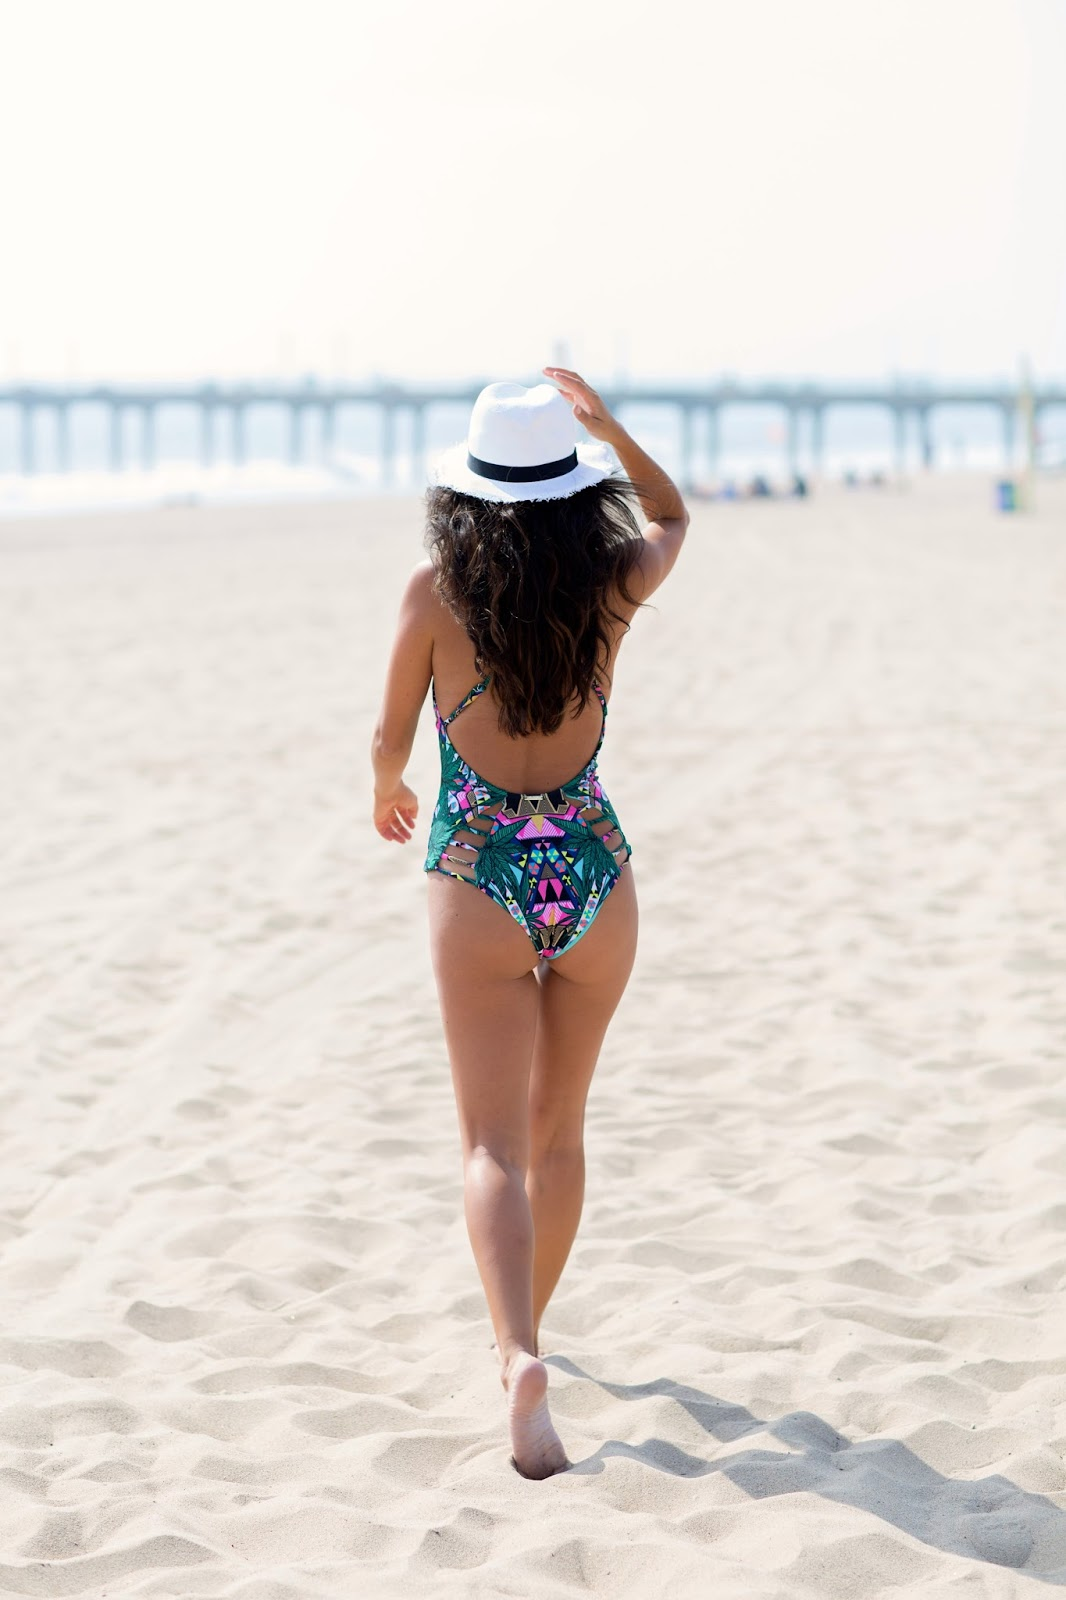 Mara Hoffman flattering one-piece, Mindy Kaling one-piece, Manhattan Beach, Summer Swimwear